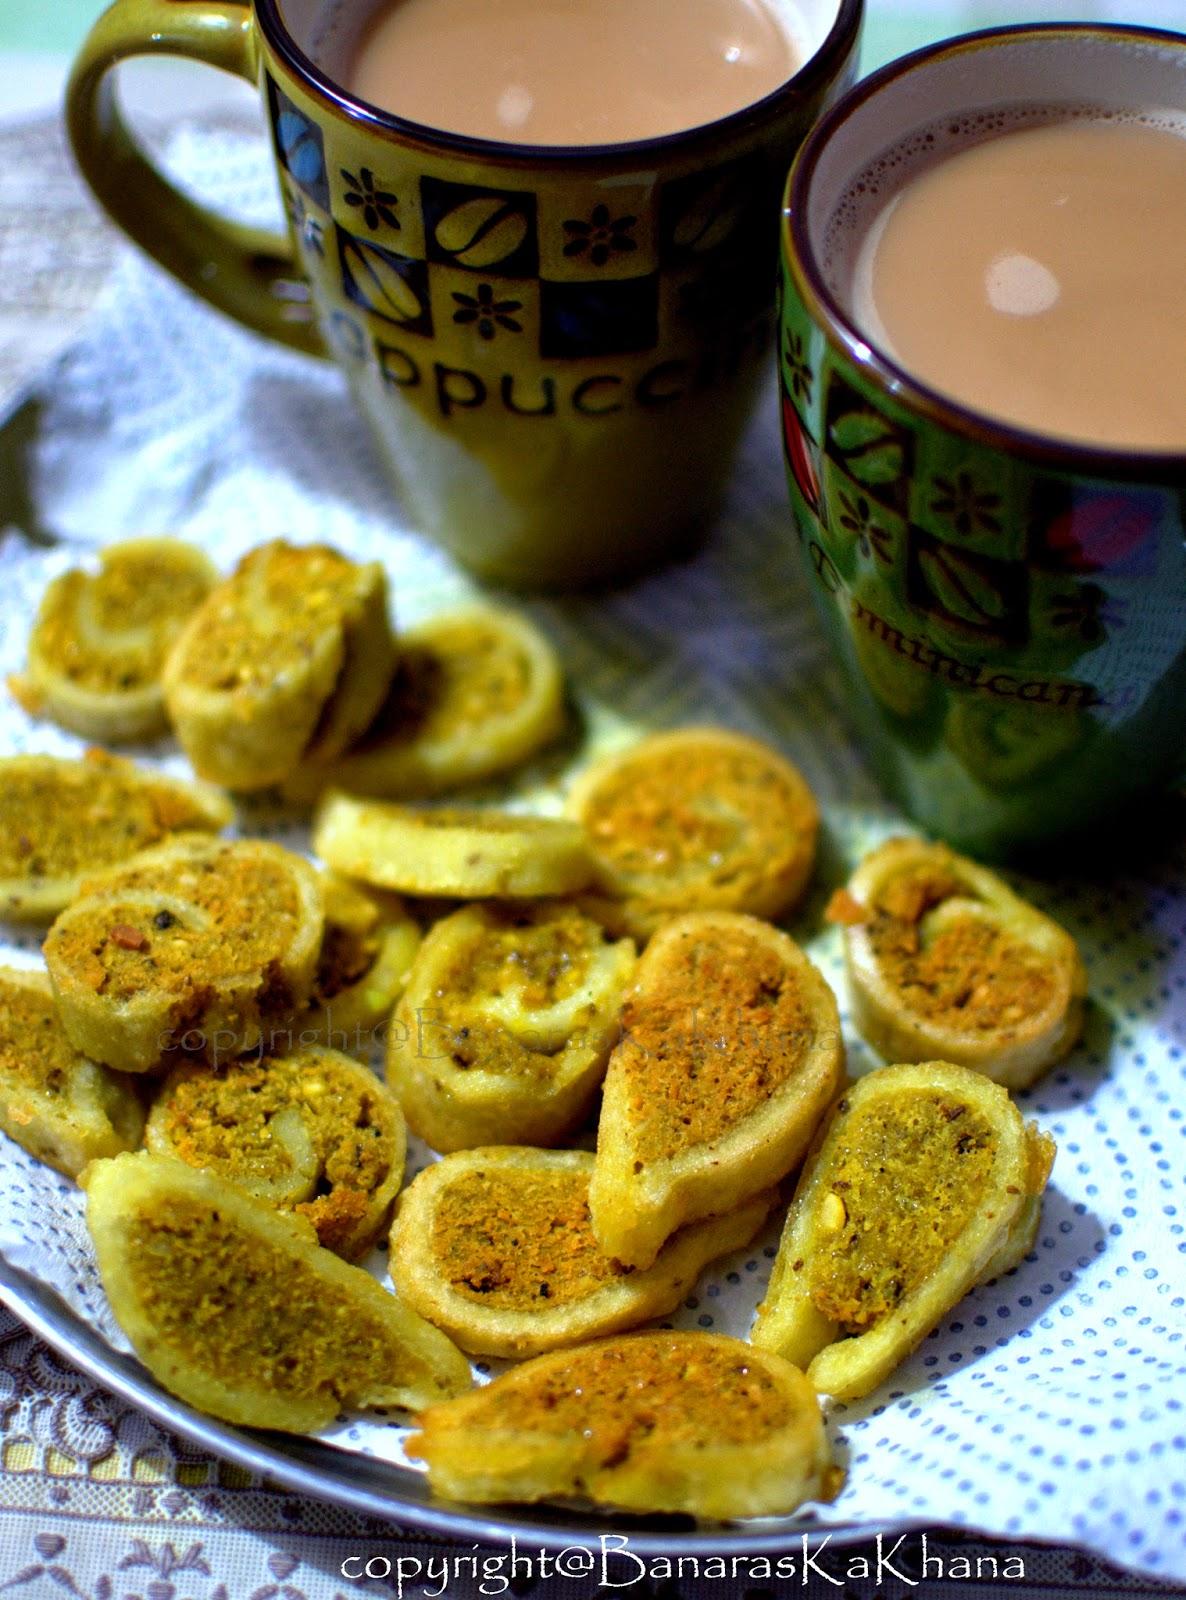 fara, goojha or peetha (steamed dumplings)